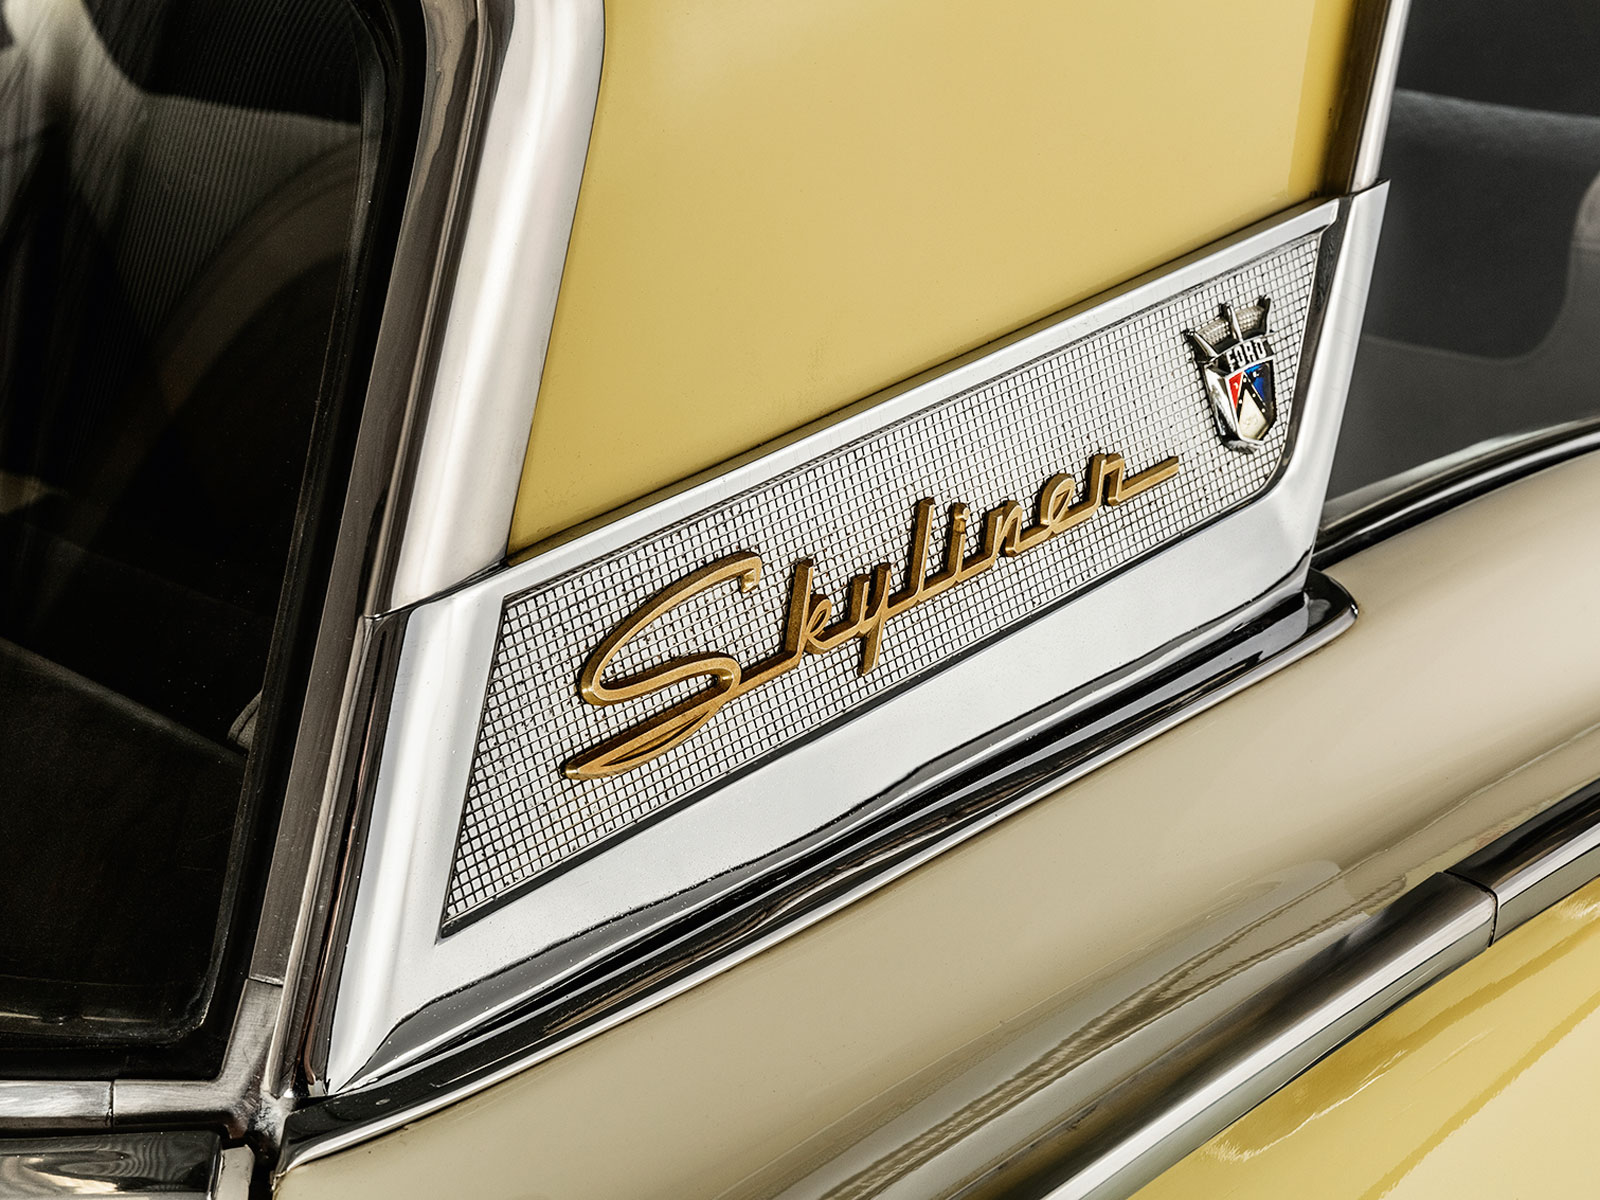 Ford Fairlane 500 Skyline